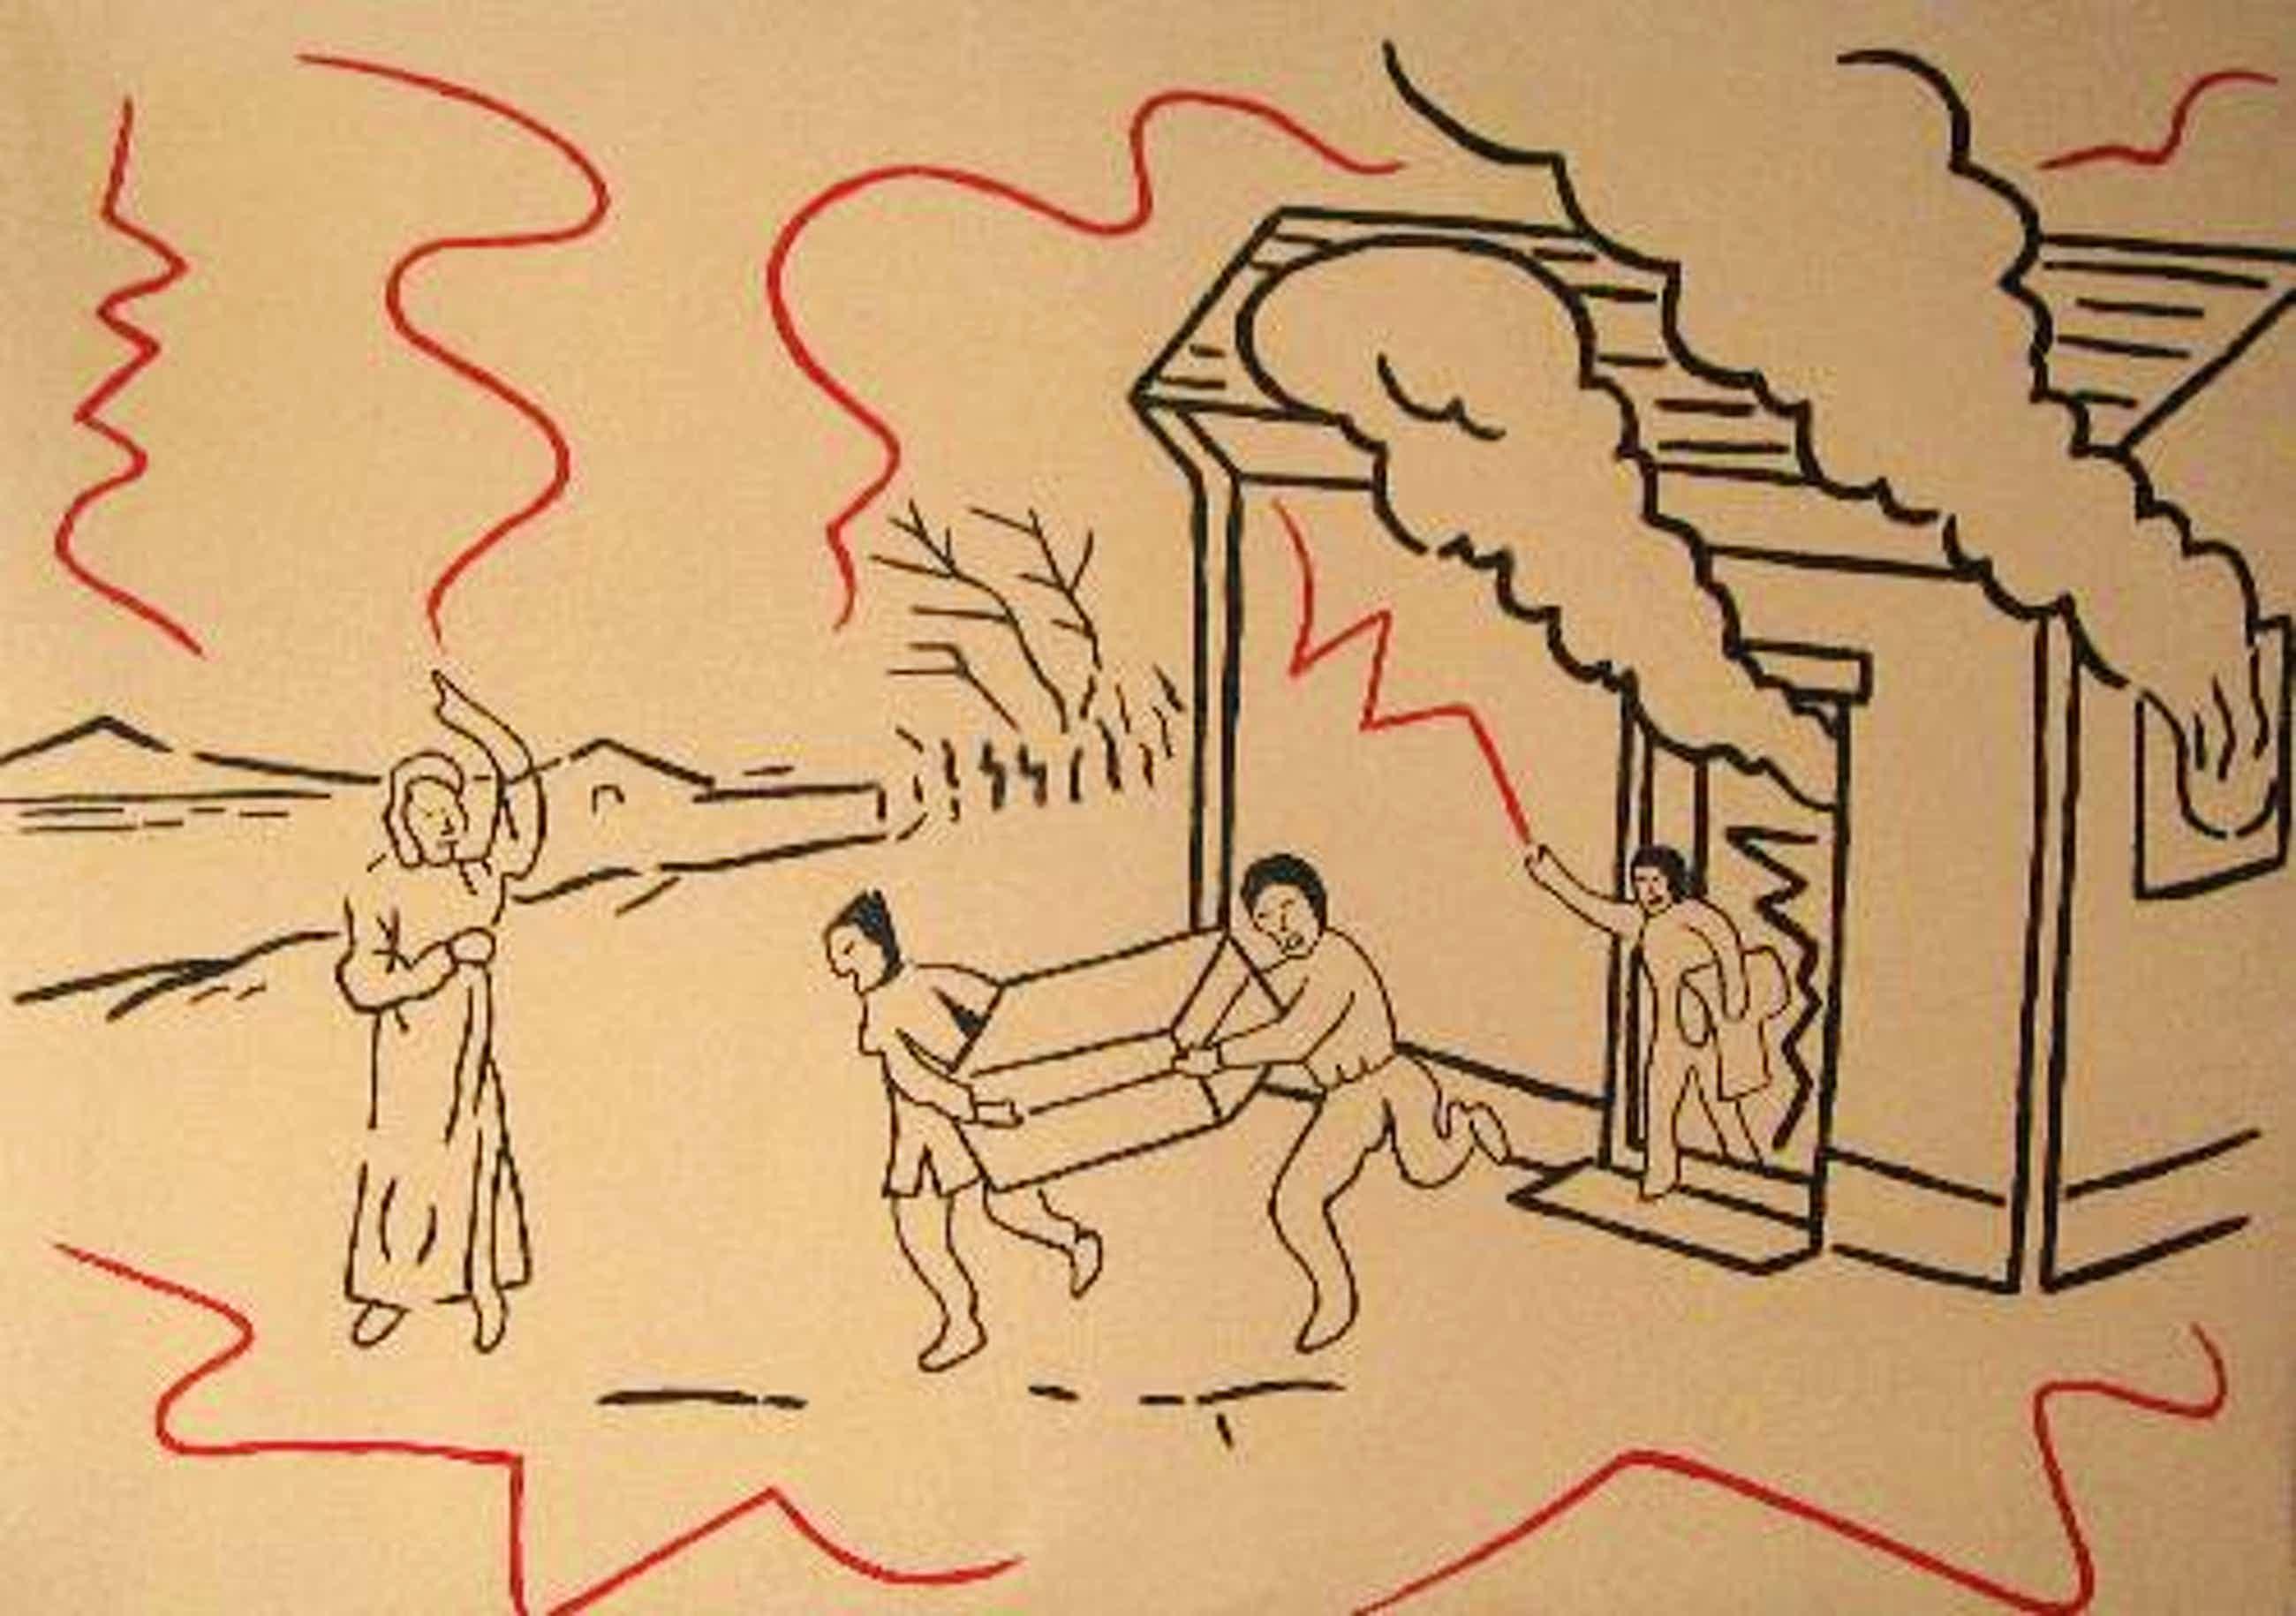 Ronnie Cutrone - Öl auf Leinwand, 1983, Original kopen? Bied vanaf 1800!